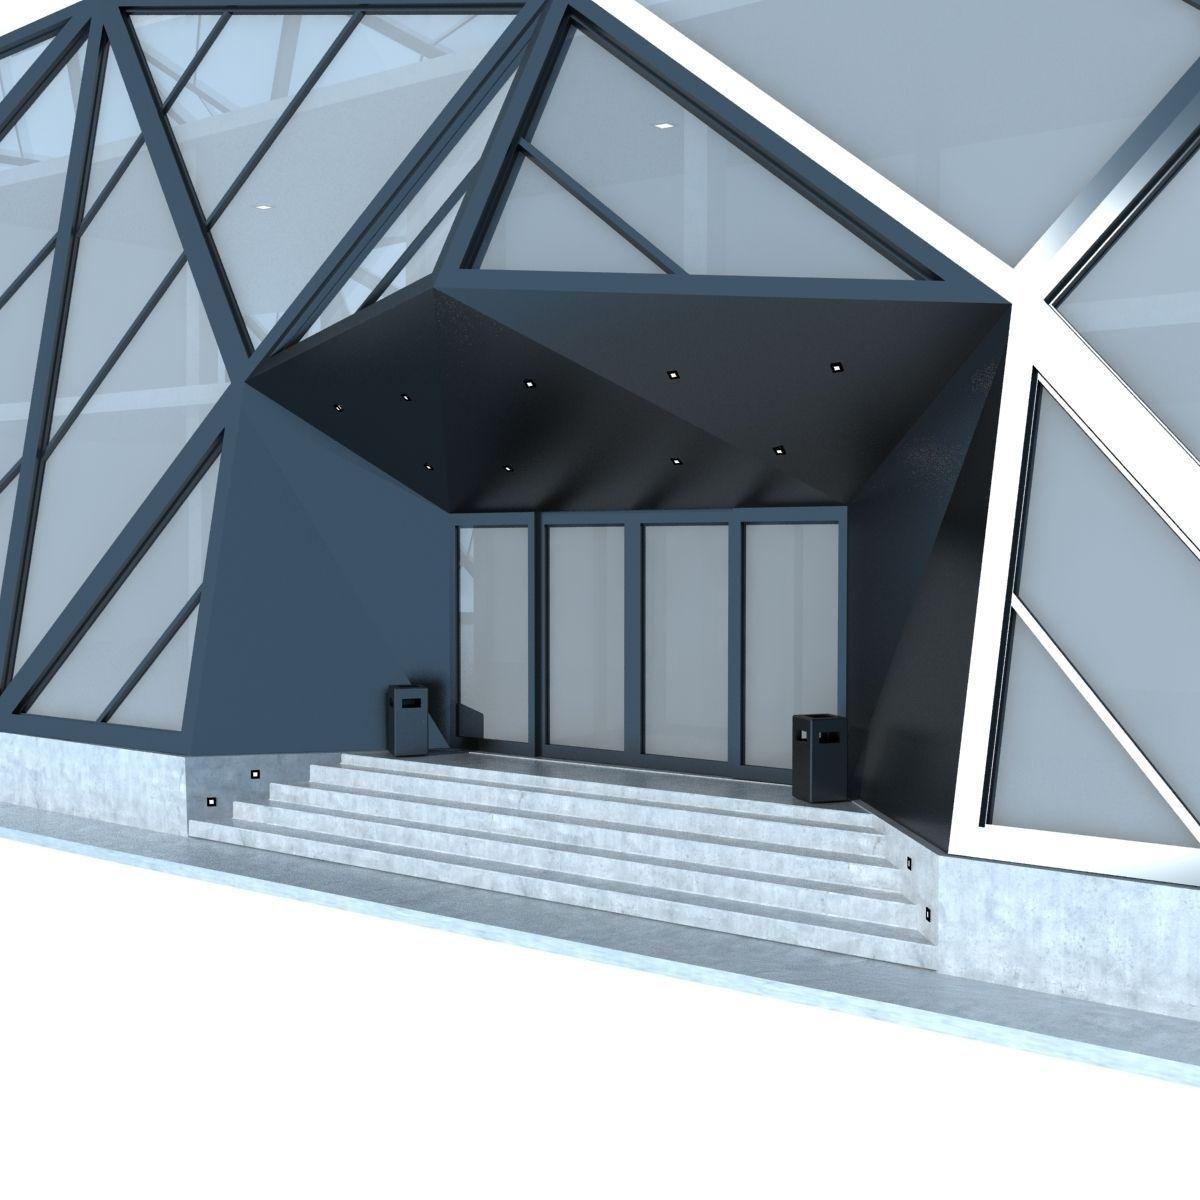 Modern futuristic building 3d model max obj 3ds fbx for 3d max building